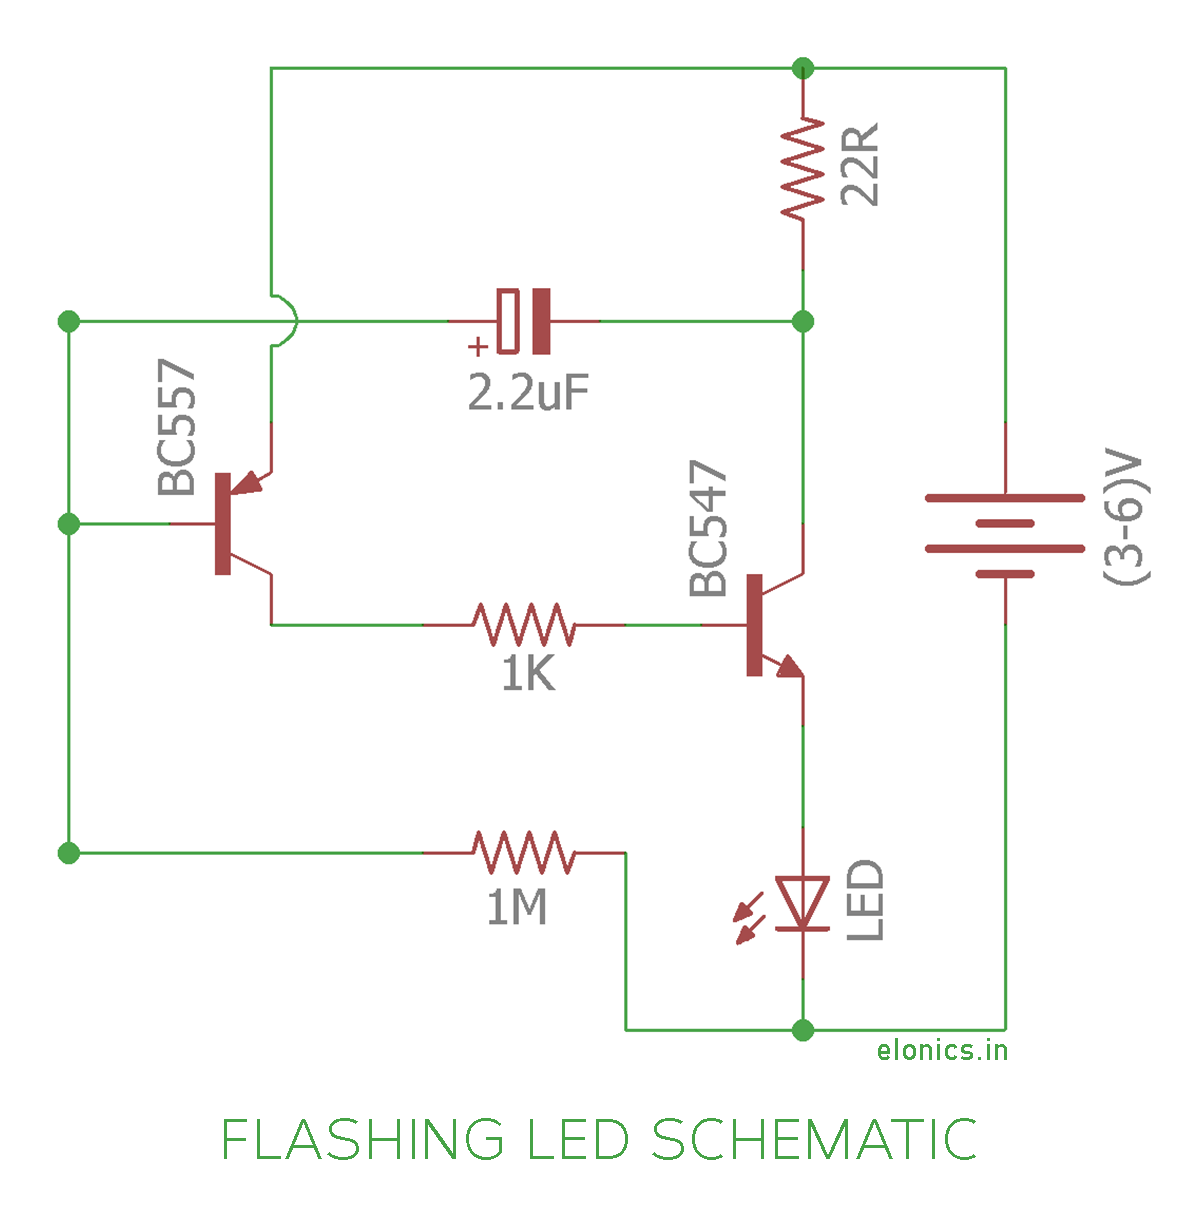 hight resolution of flashing blinking led circuit using transistors schematic